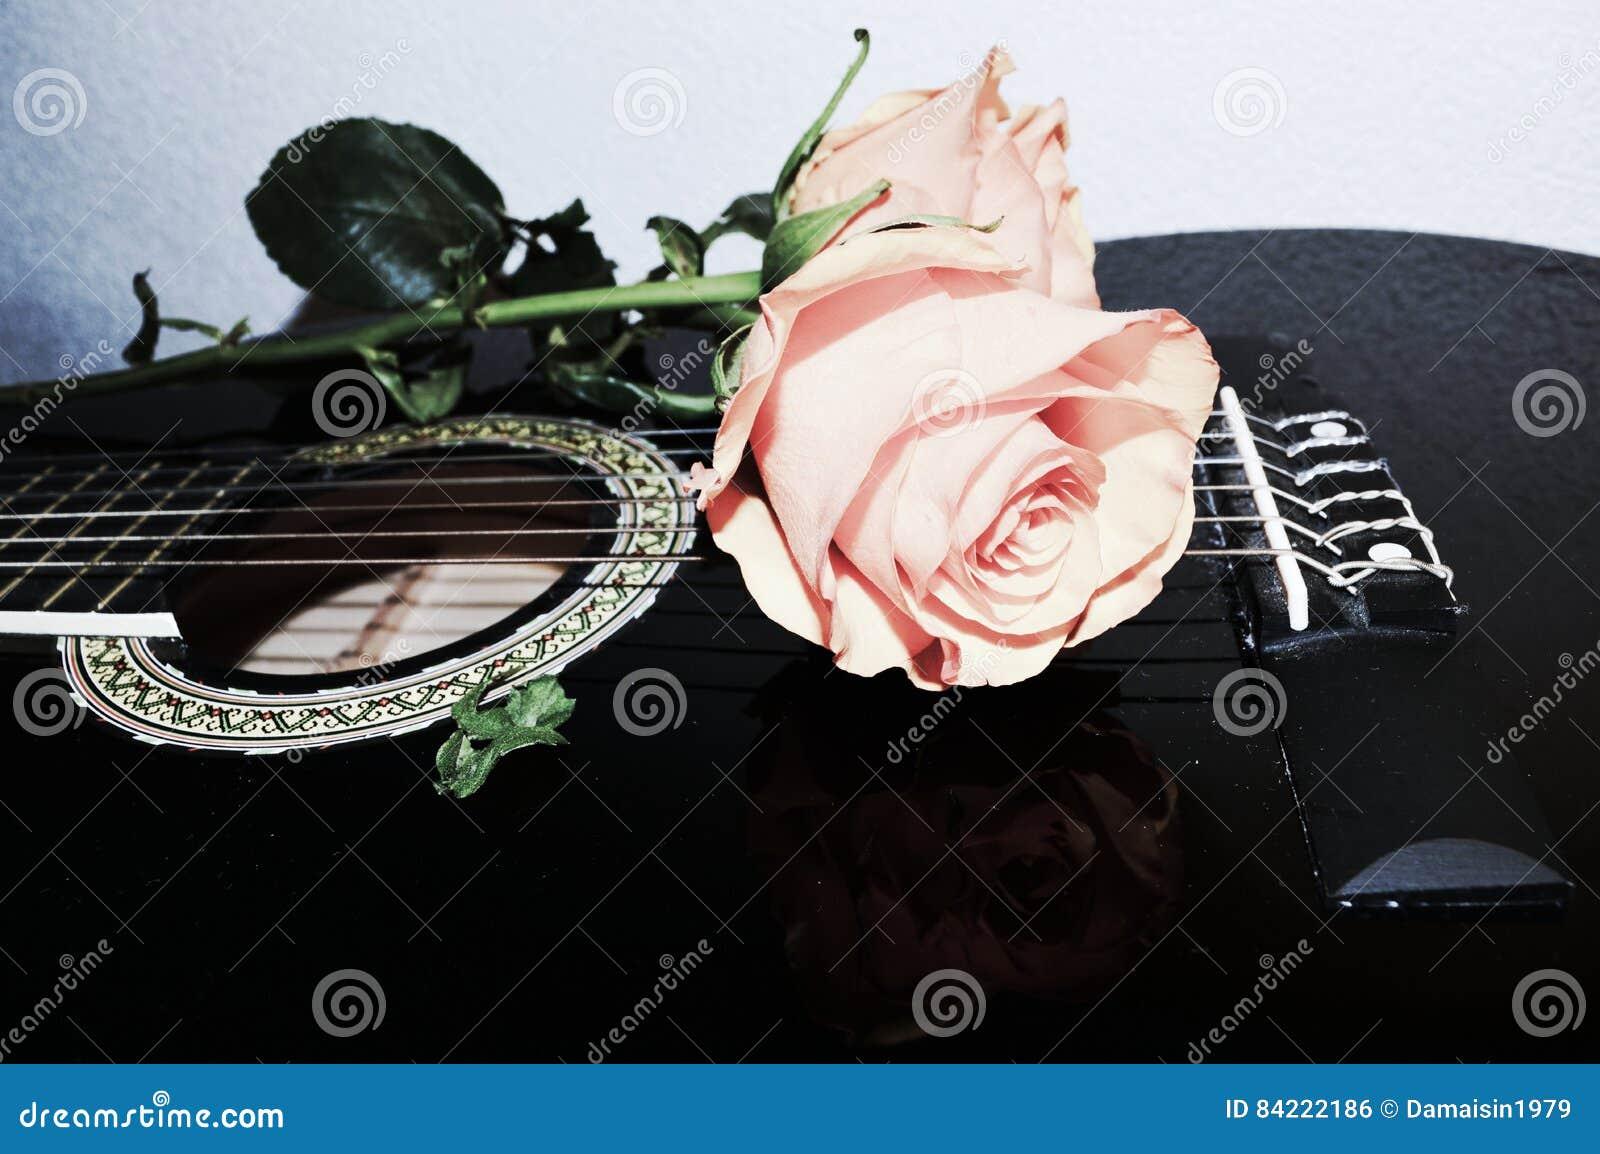 Sznurki i róże, symbole